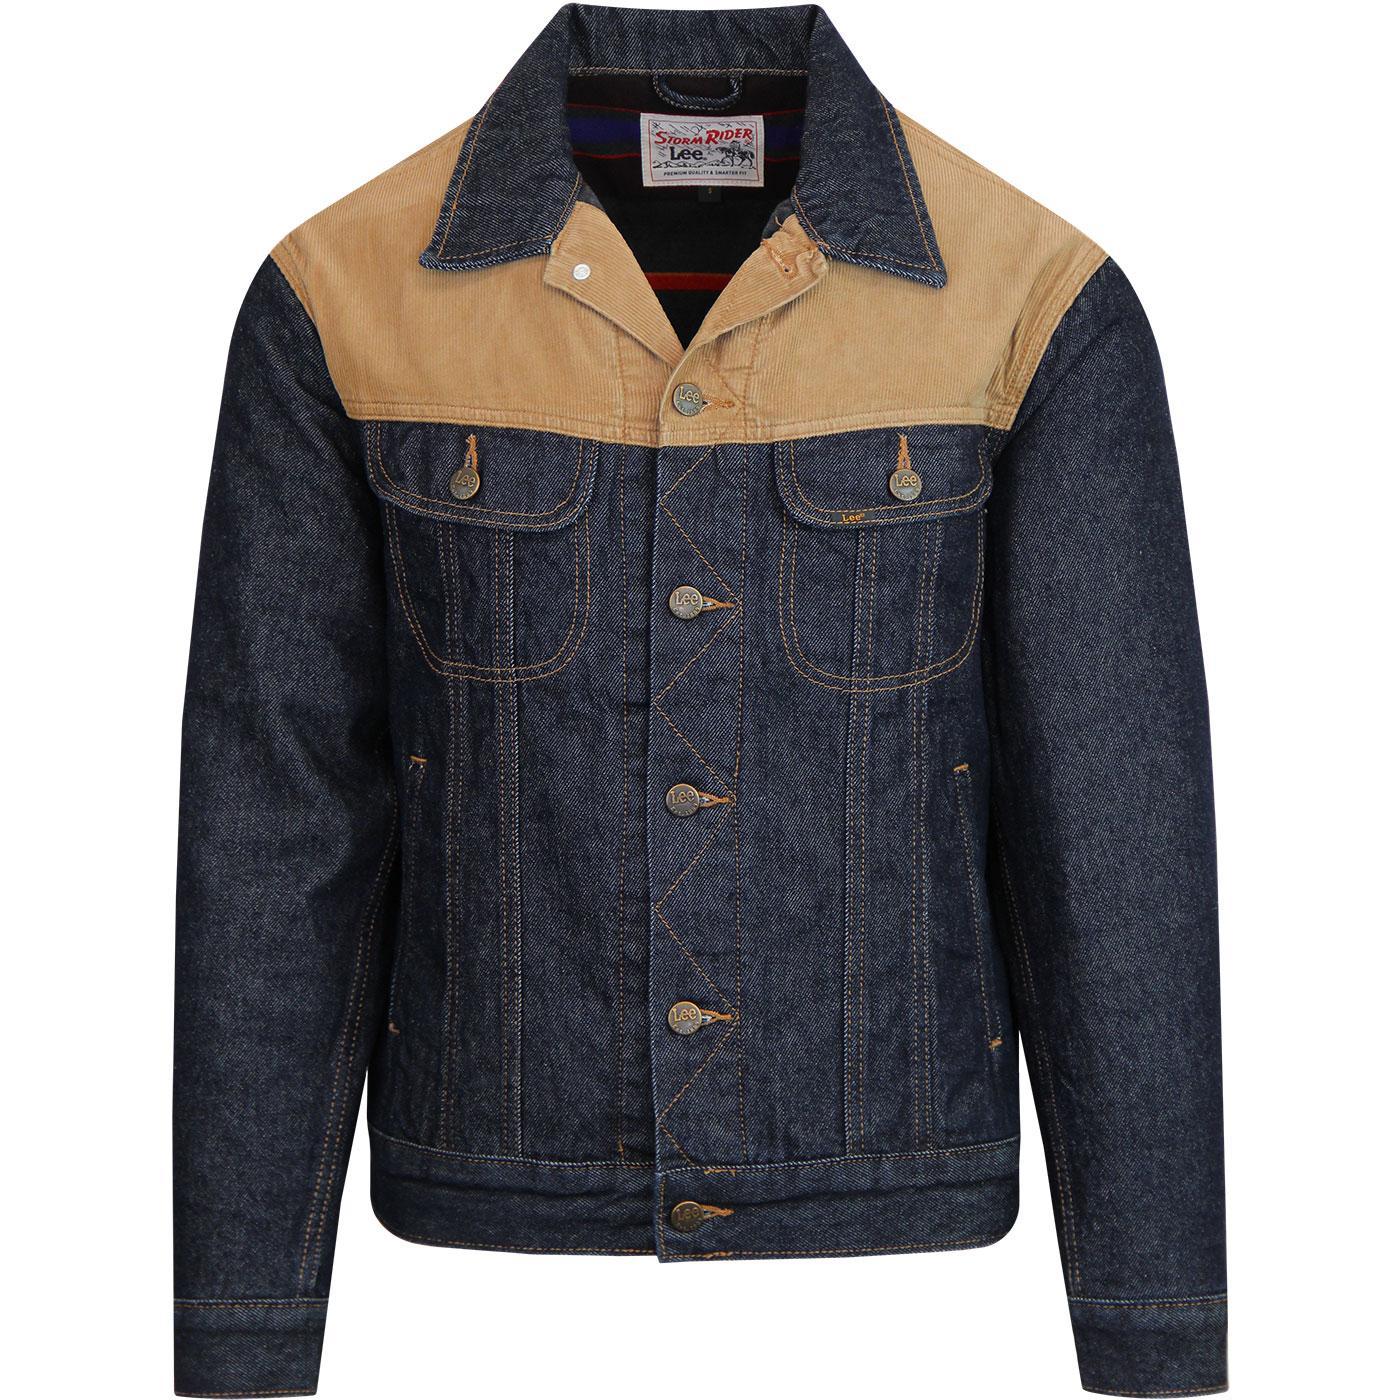 LEE Storm Rider Men's Retro Cord & Denim Jacket